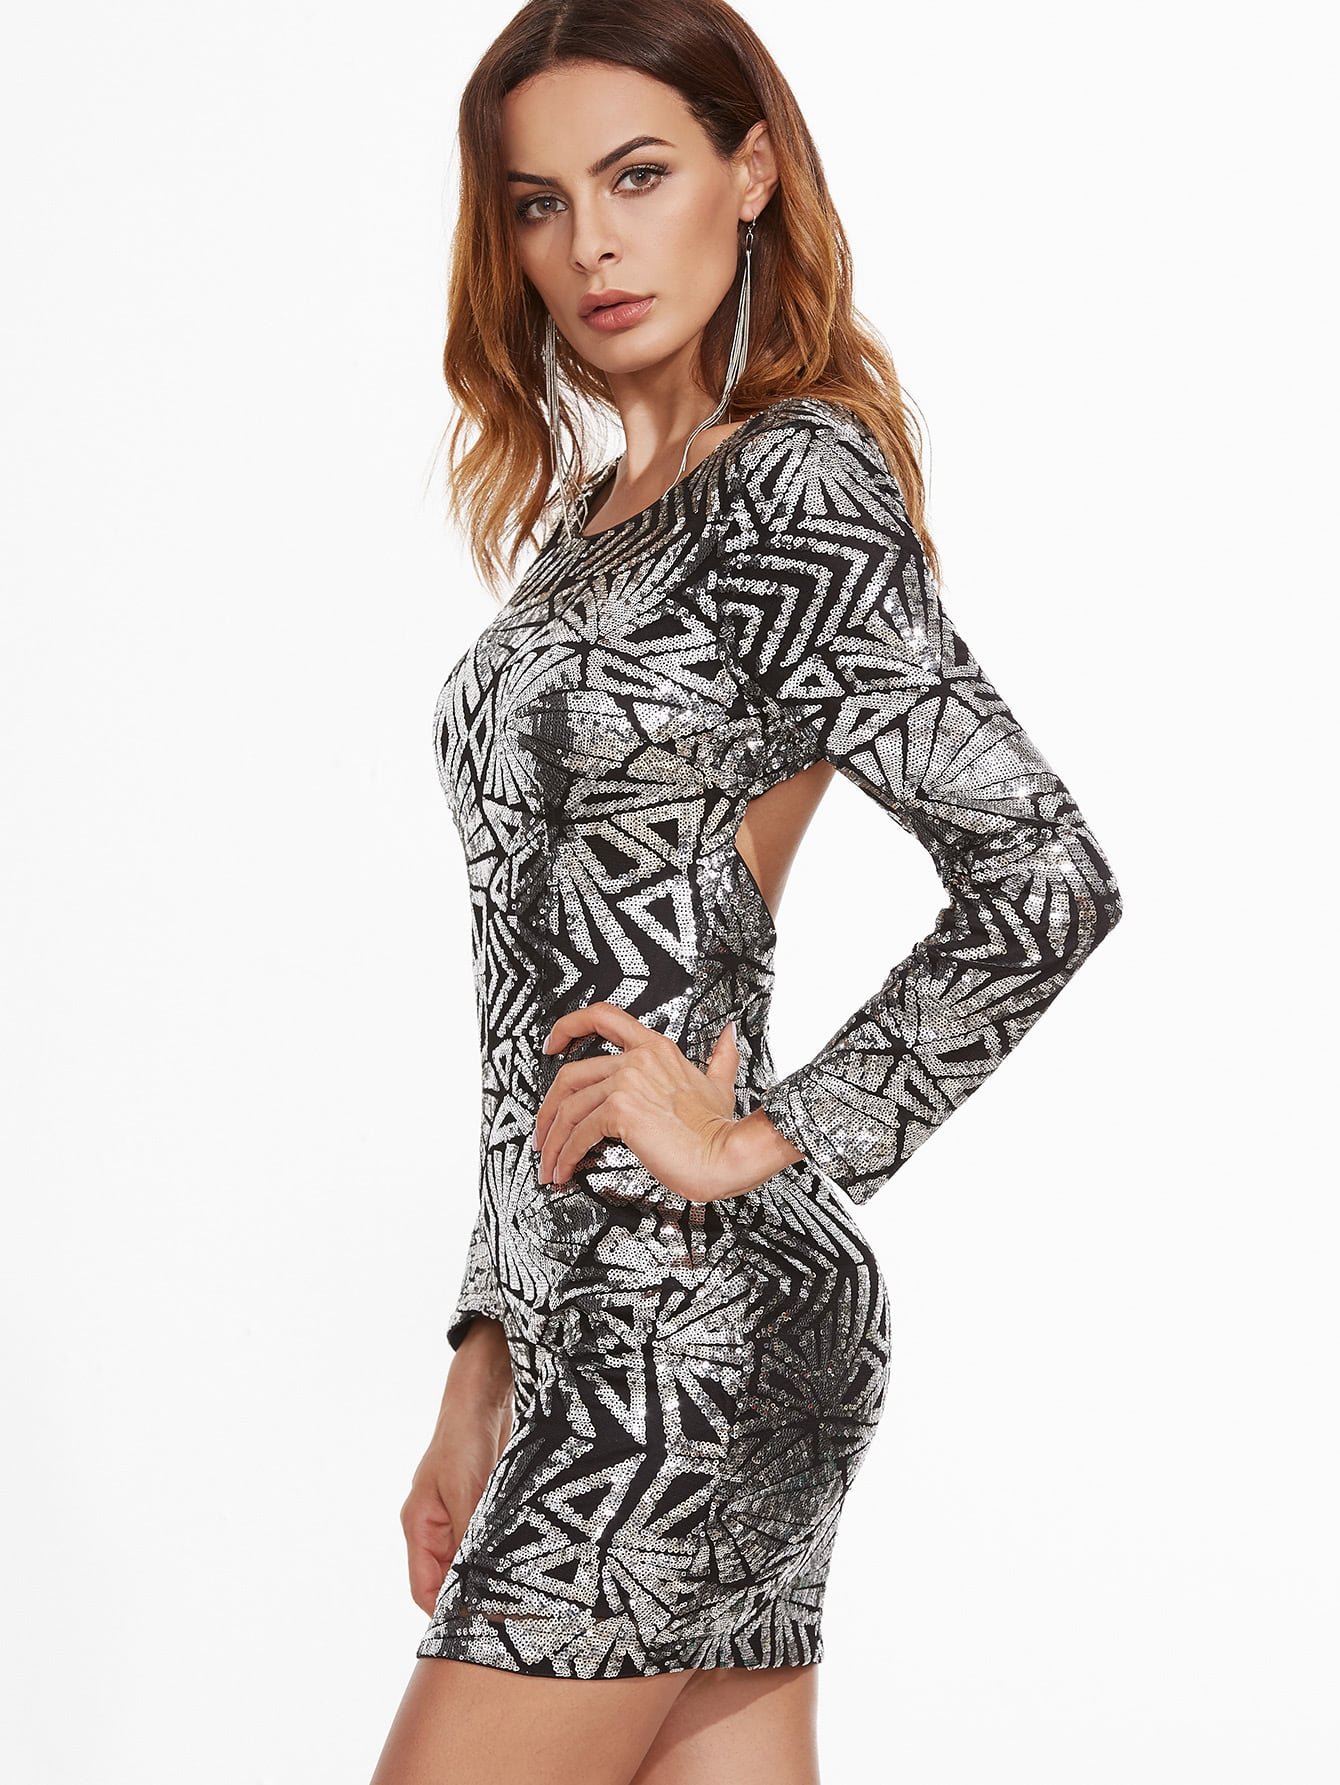 Geo Sequin Open Back Bodycon Dress dress161025704